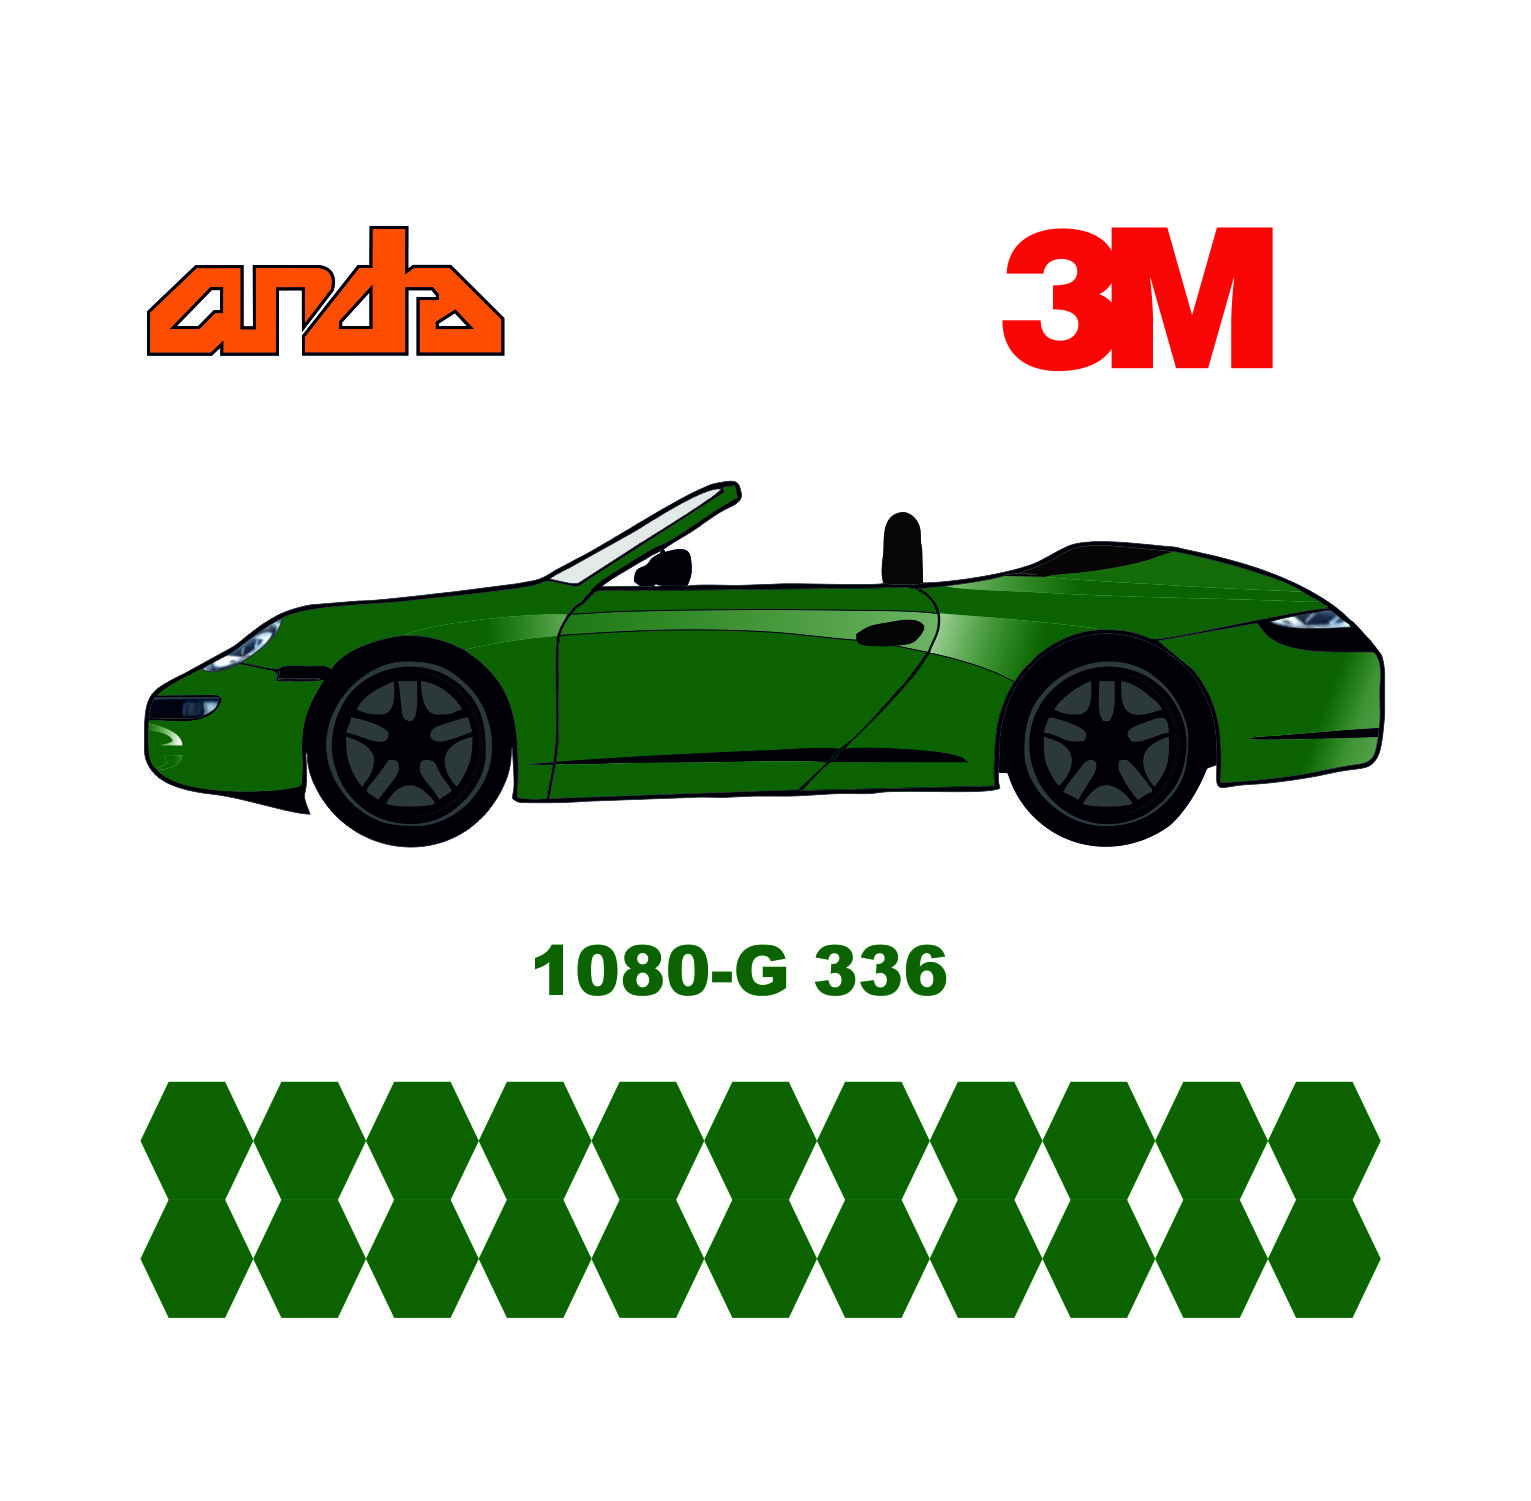 3M 1080-G336 Parlak Metalik Yeşil 1